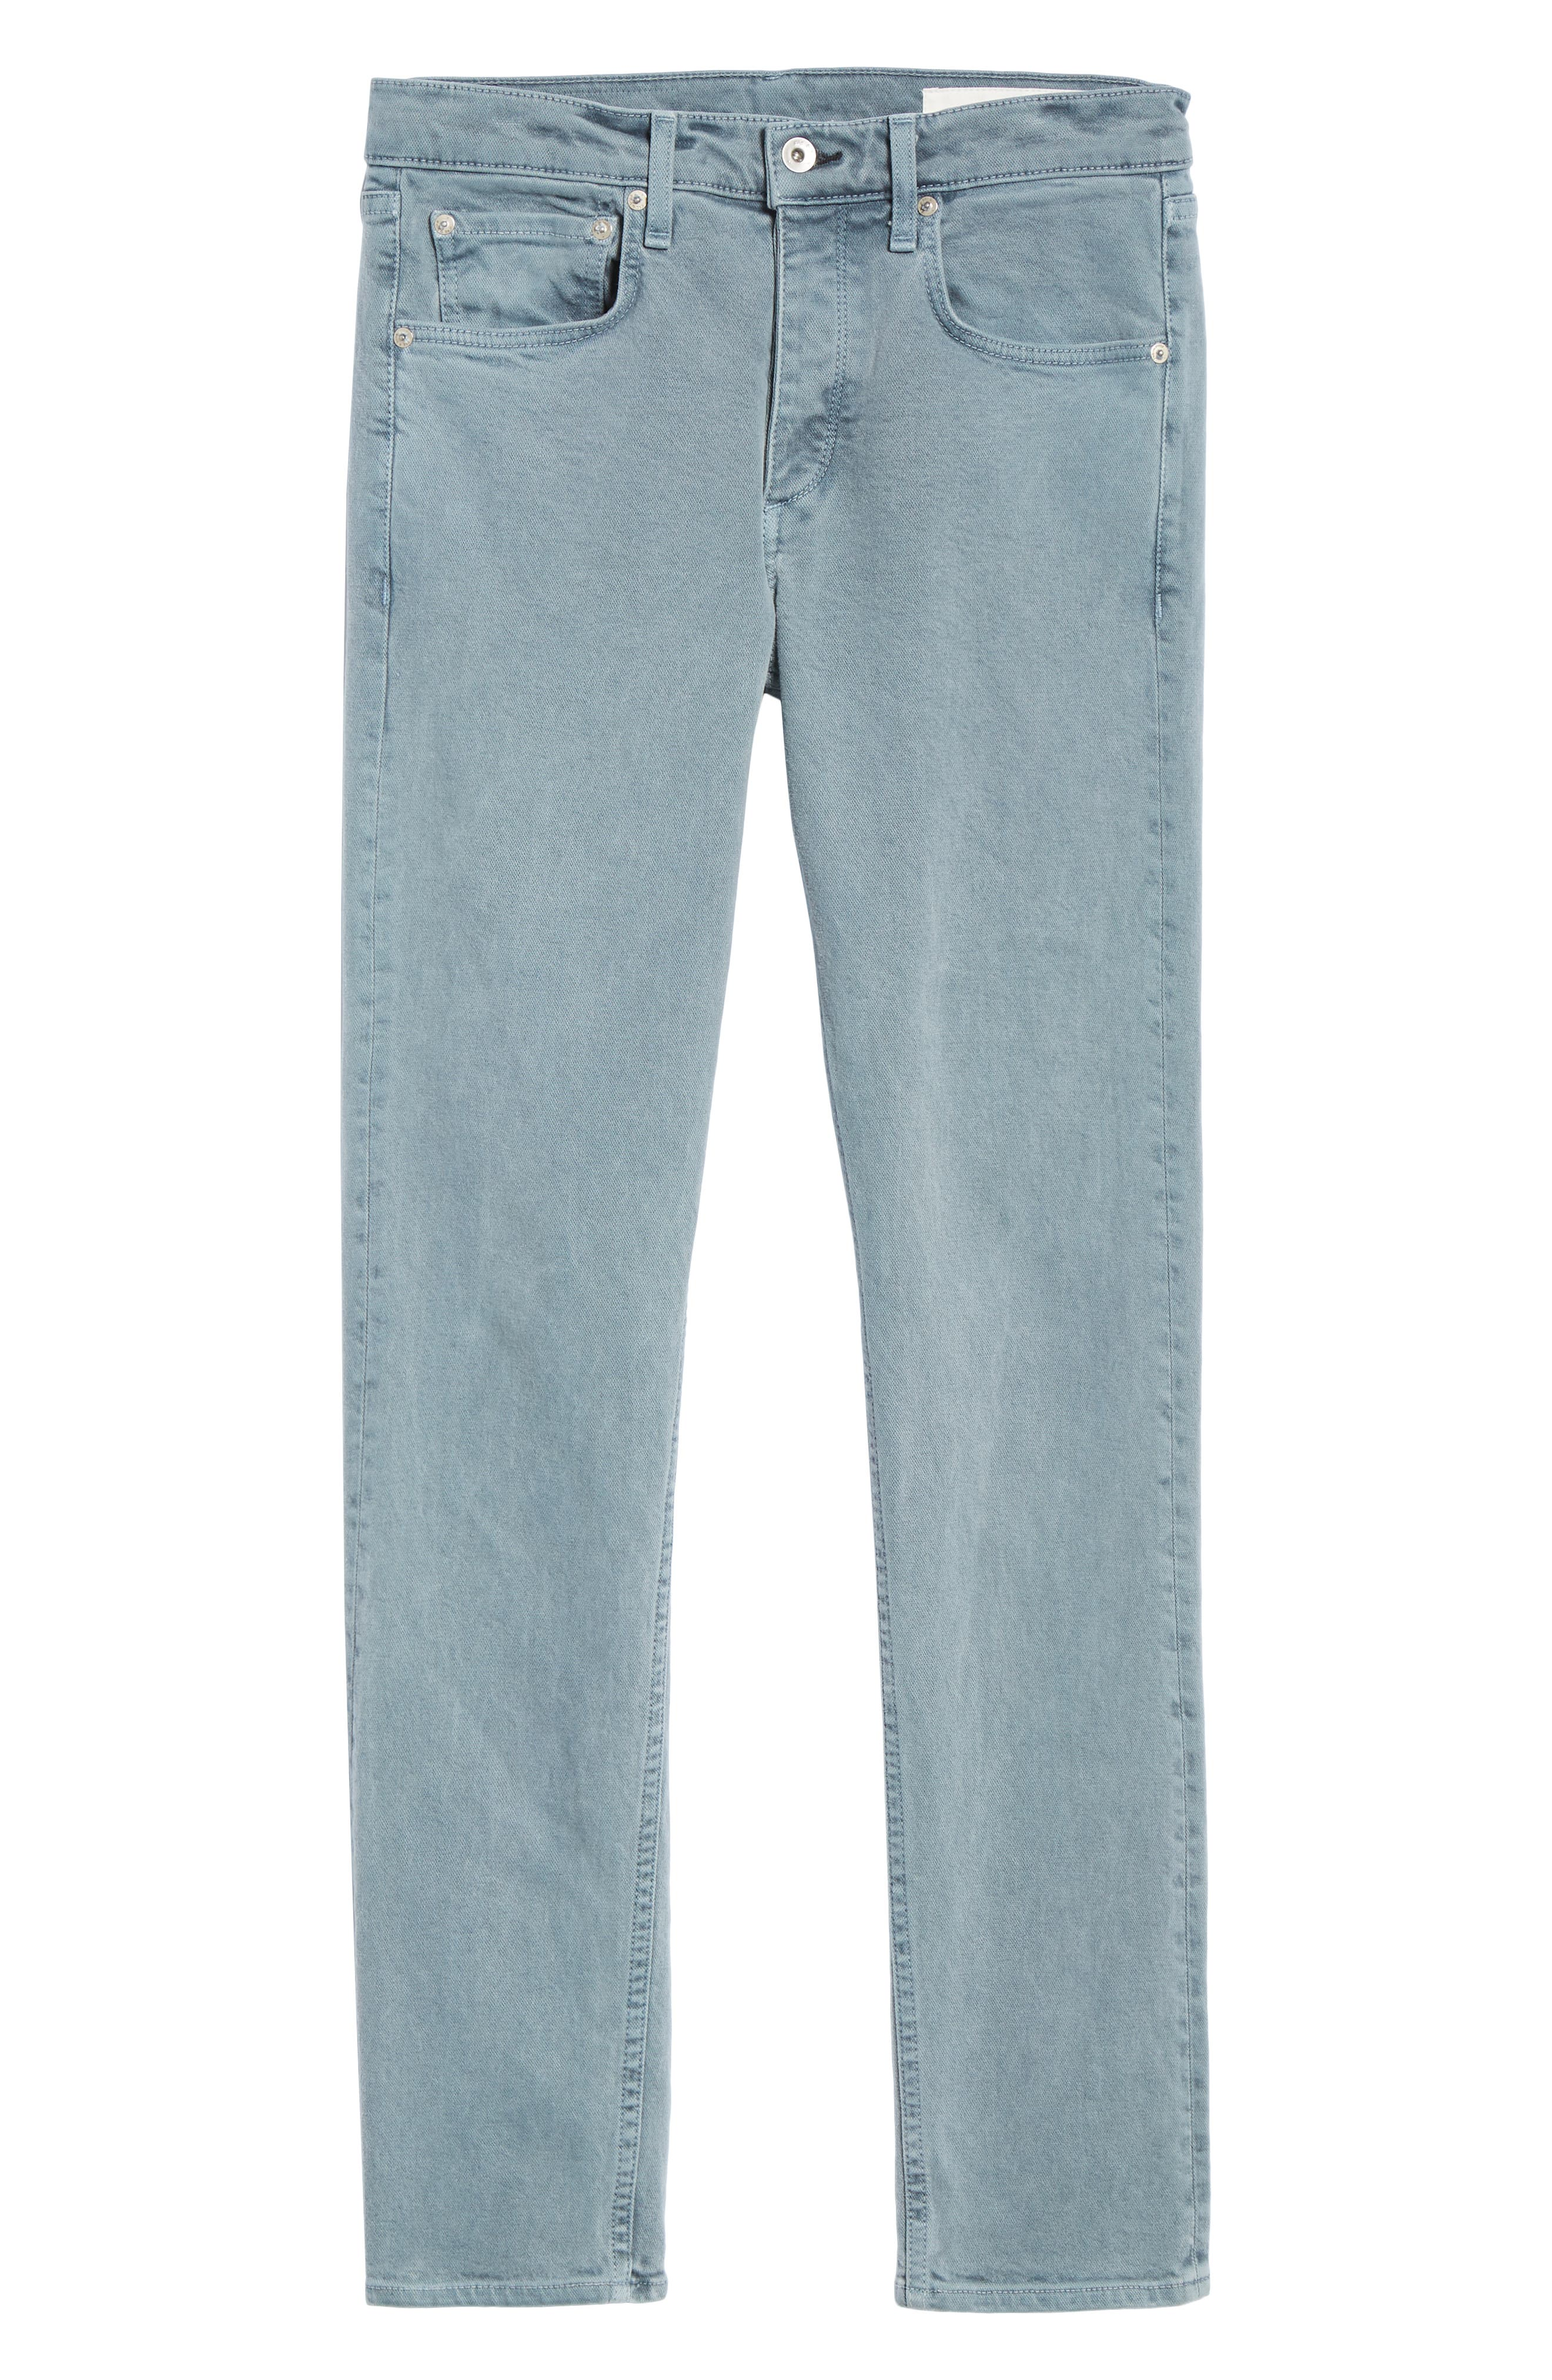 RAG & BONE,                             Fit 2 Slim Fit Jeans,                             Alternate thumbnail 6, color,                             SAUSALITO